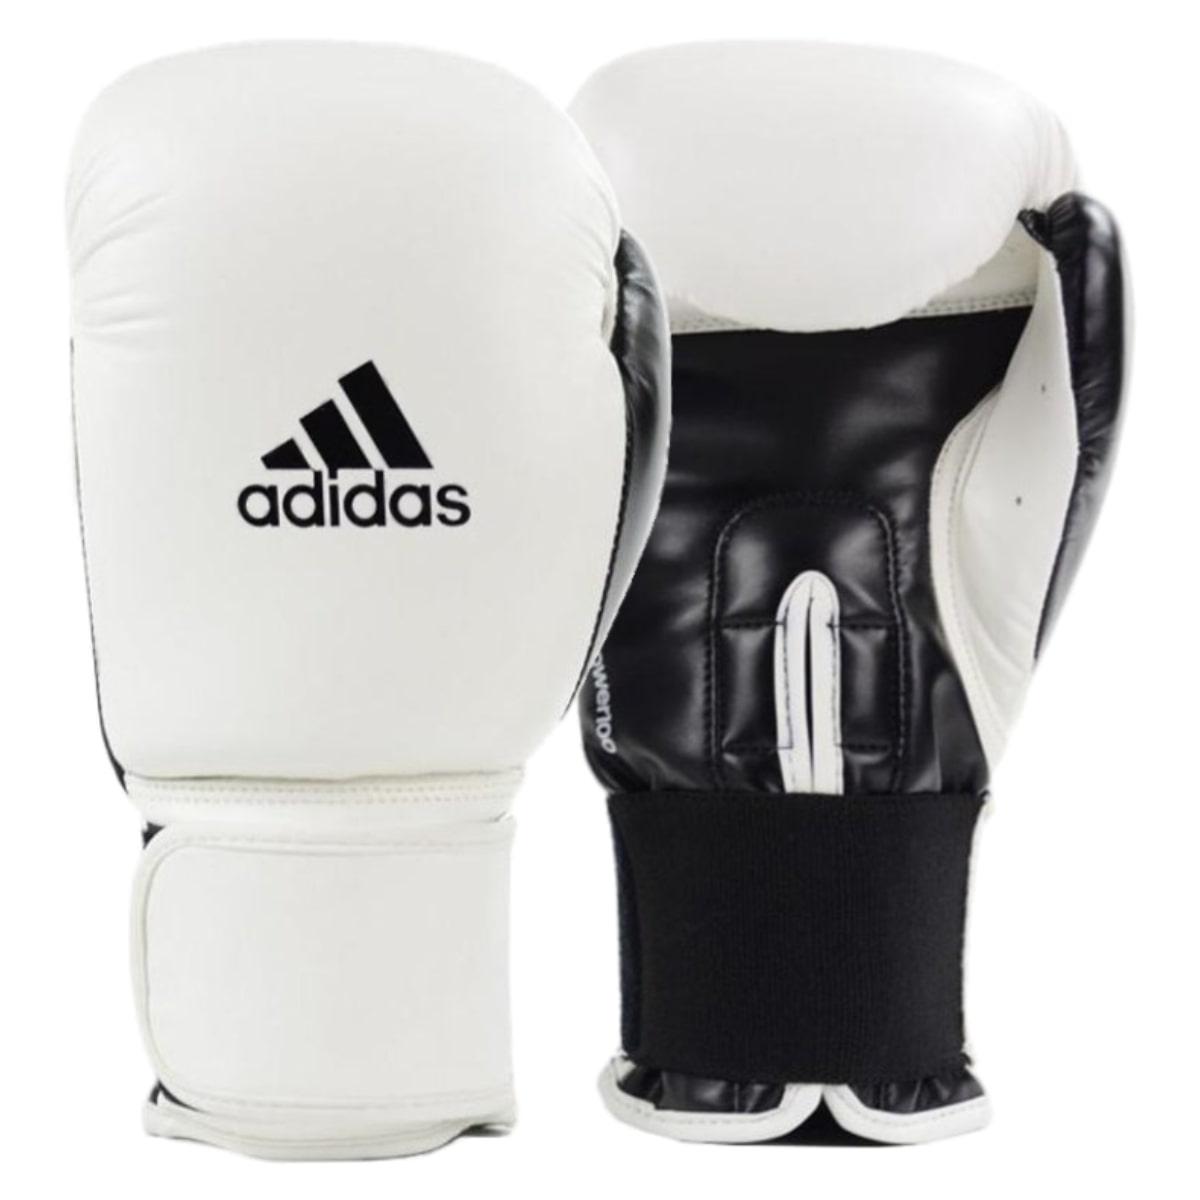 Kit Boxe Adidas Power 100: Luva + Bandagem + Bucal - Branco